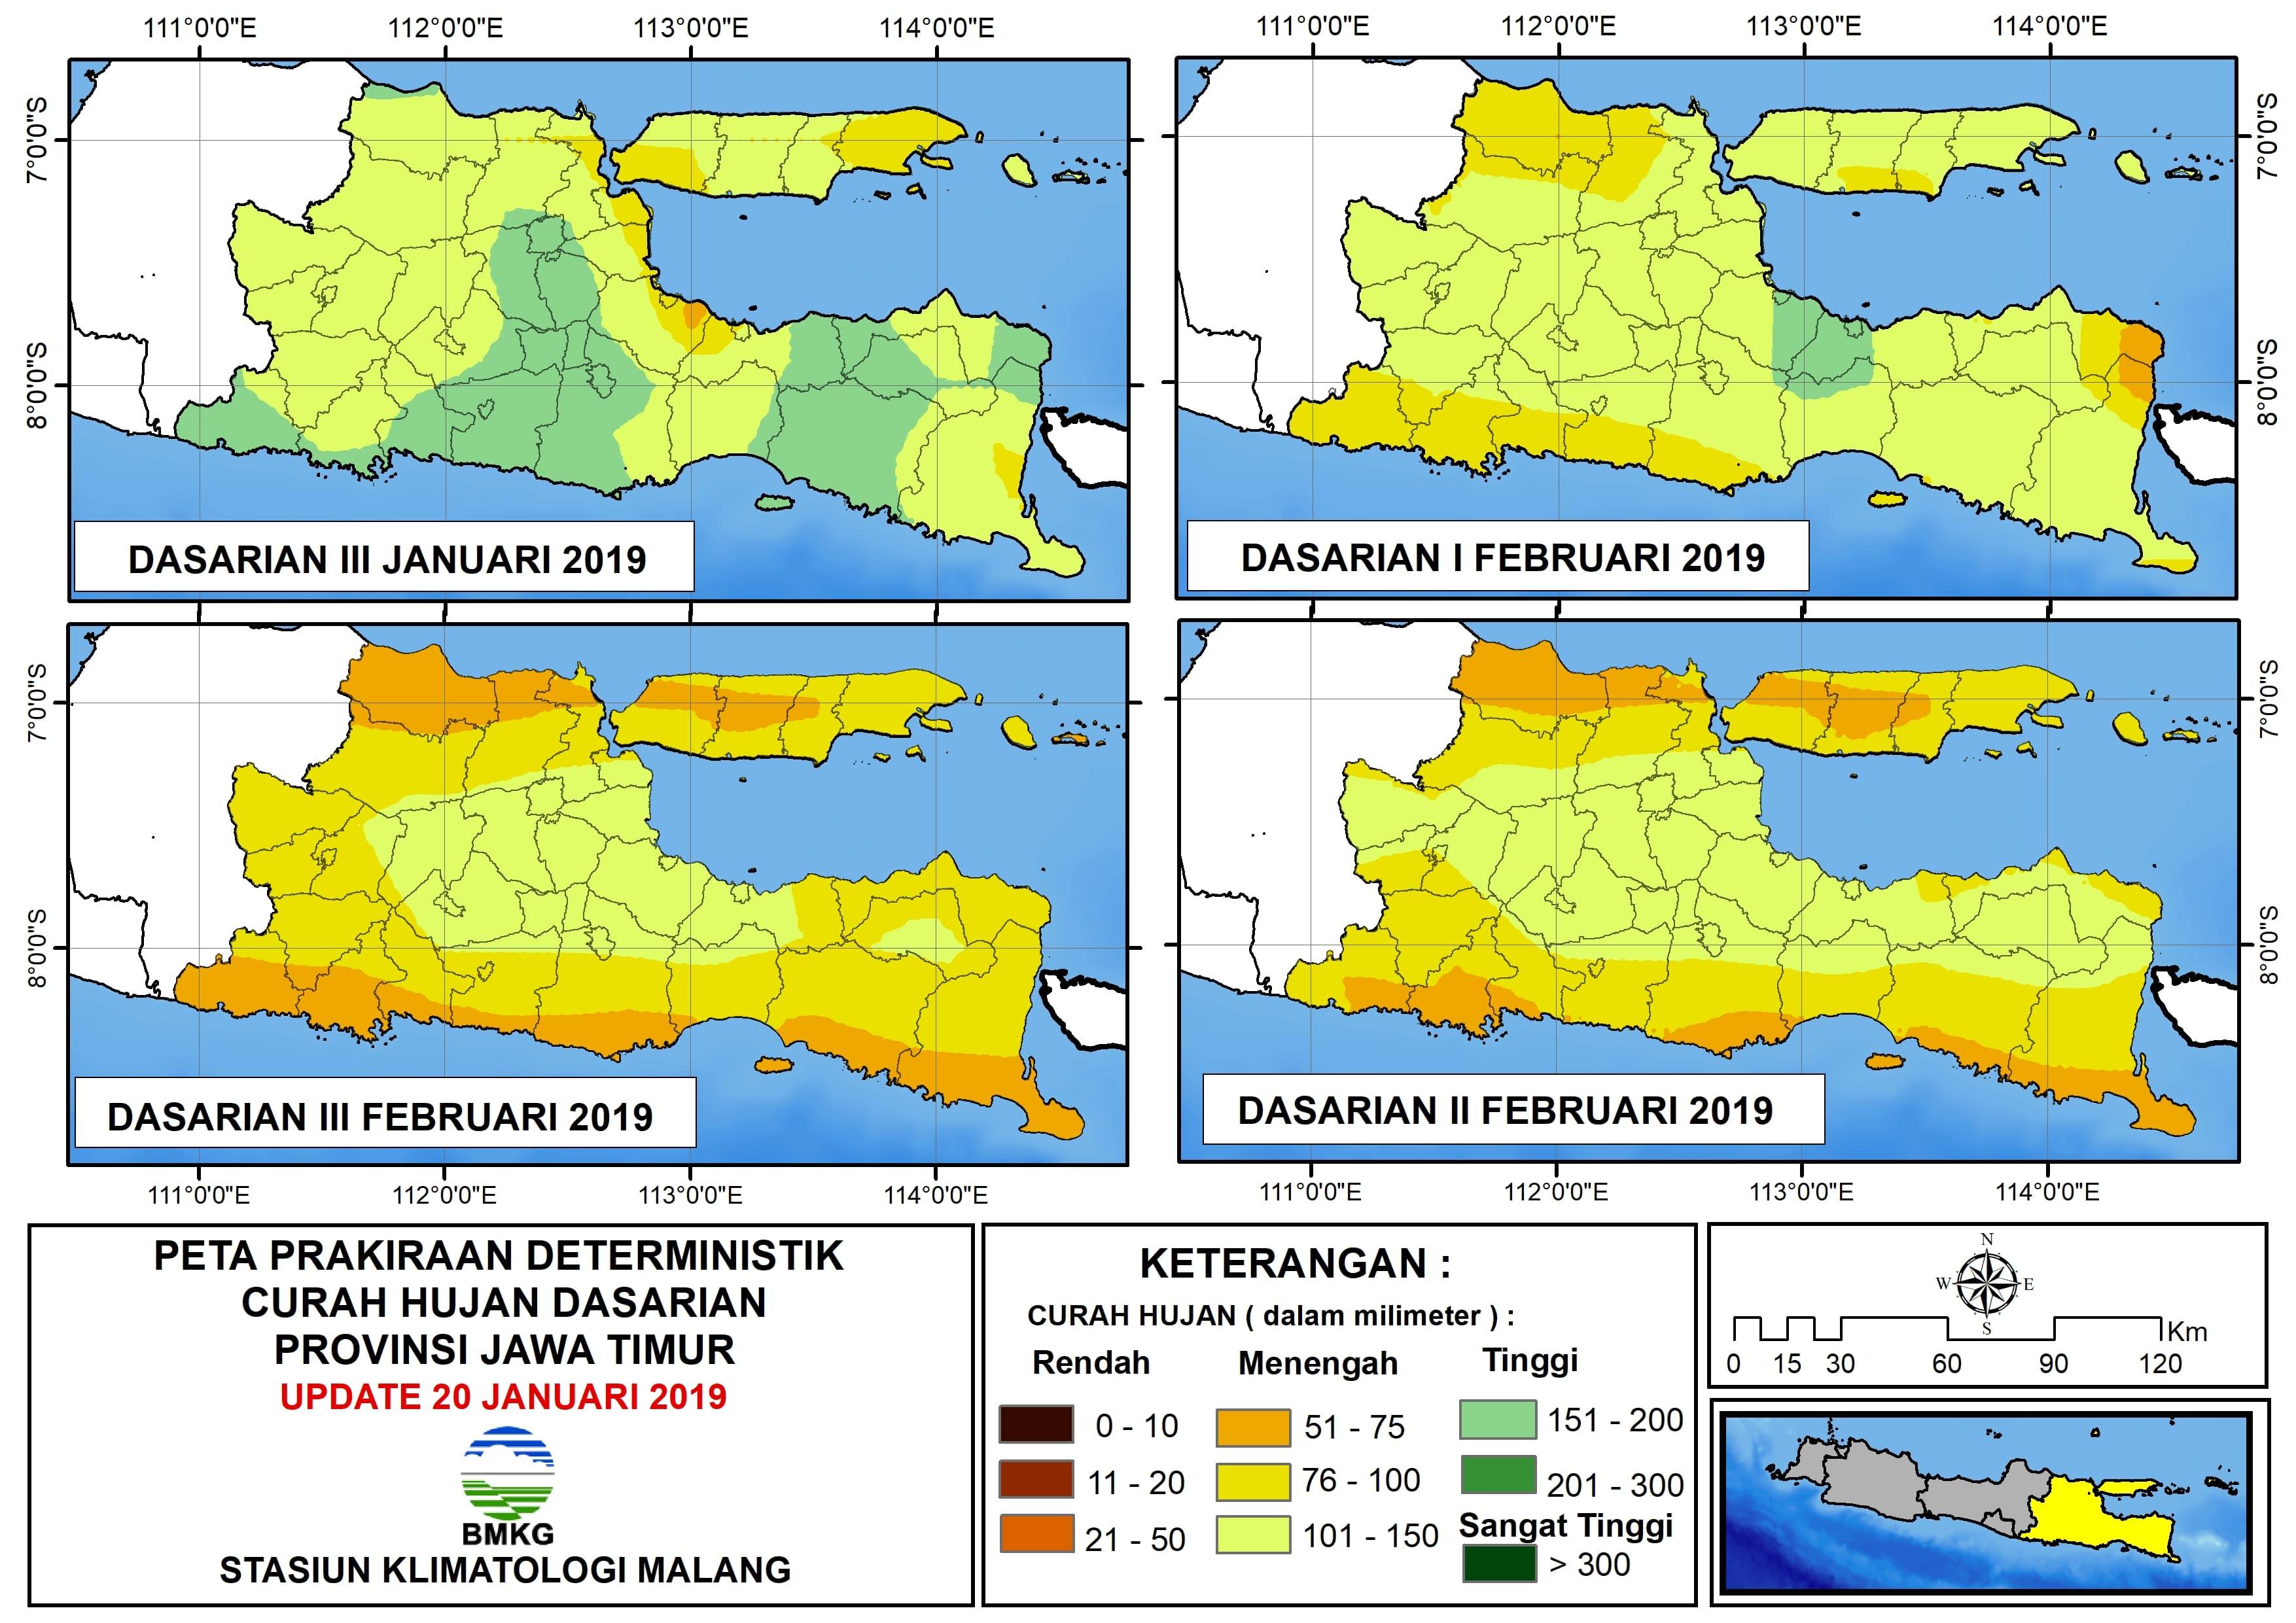 Peta Prakiraan Deterministik Curah Hujan Dasarian Provinsi Jawa Timur Update 20 Januari 2019